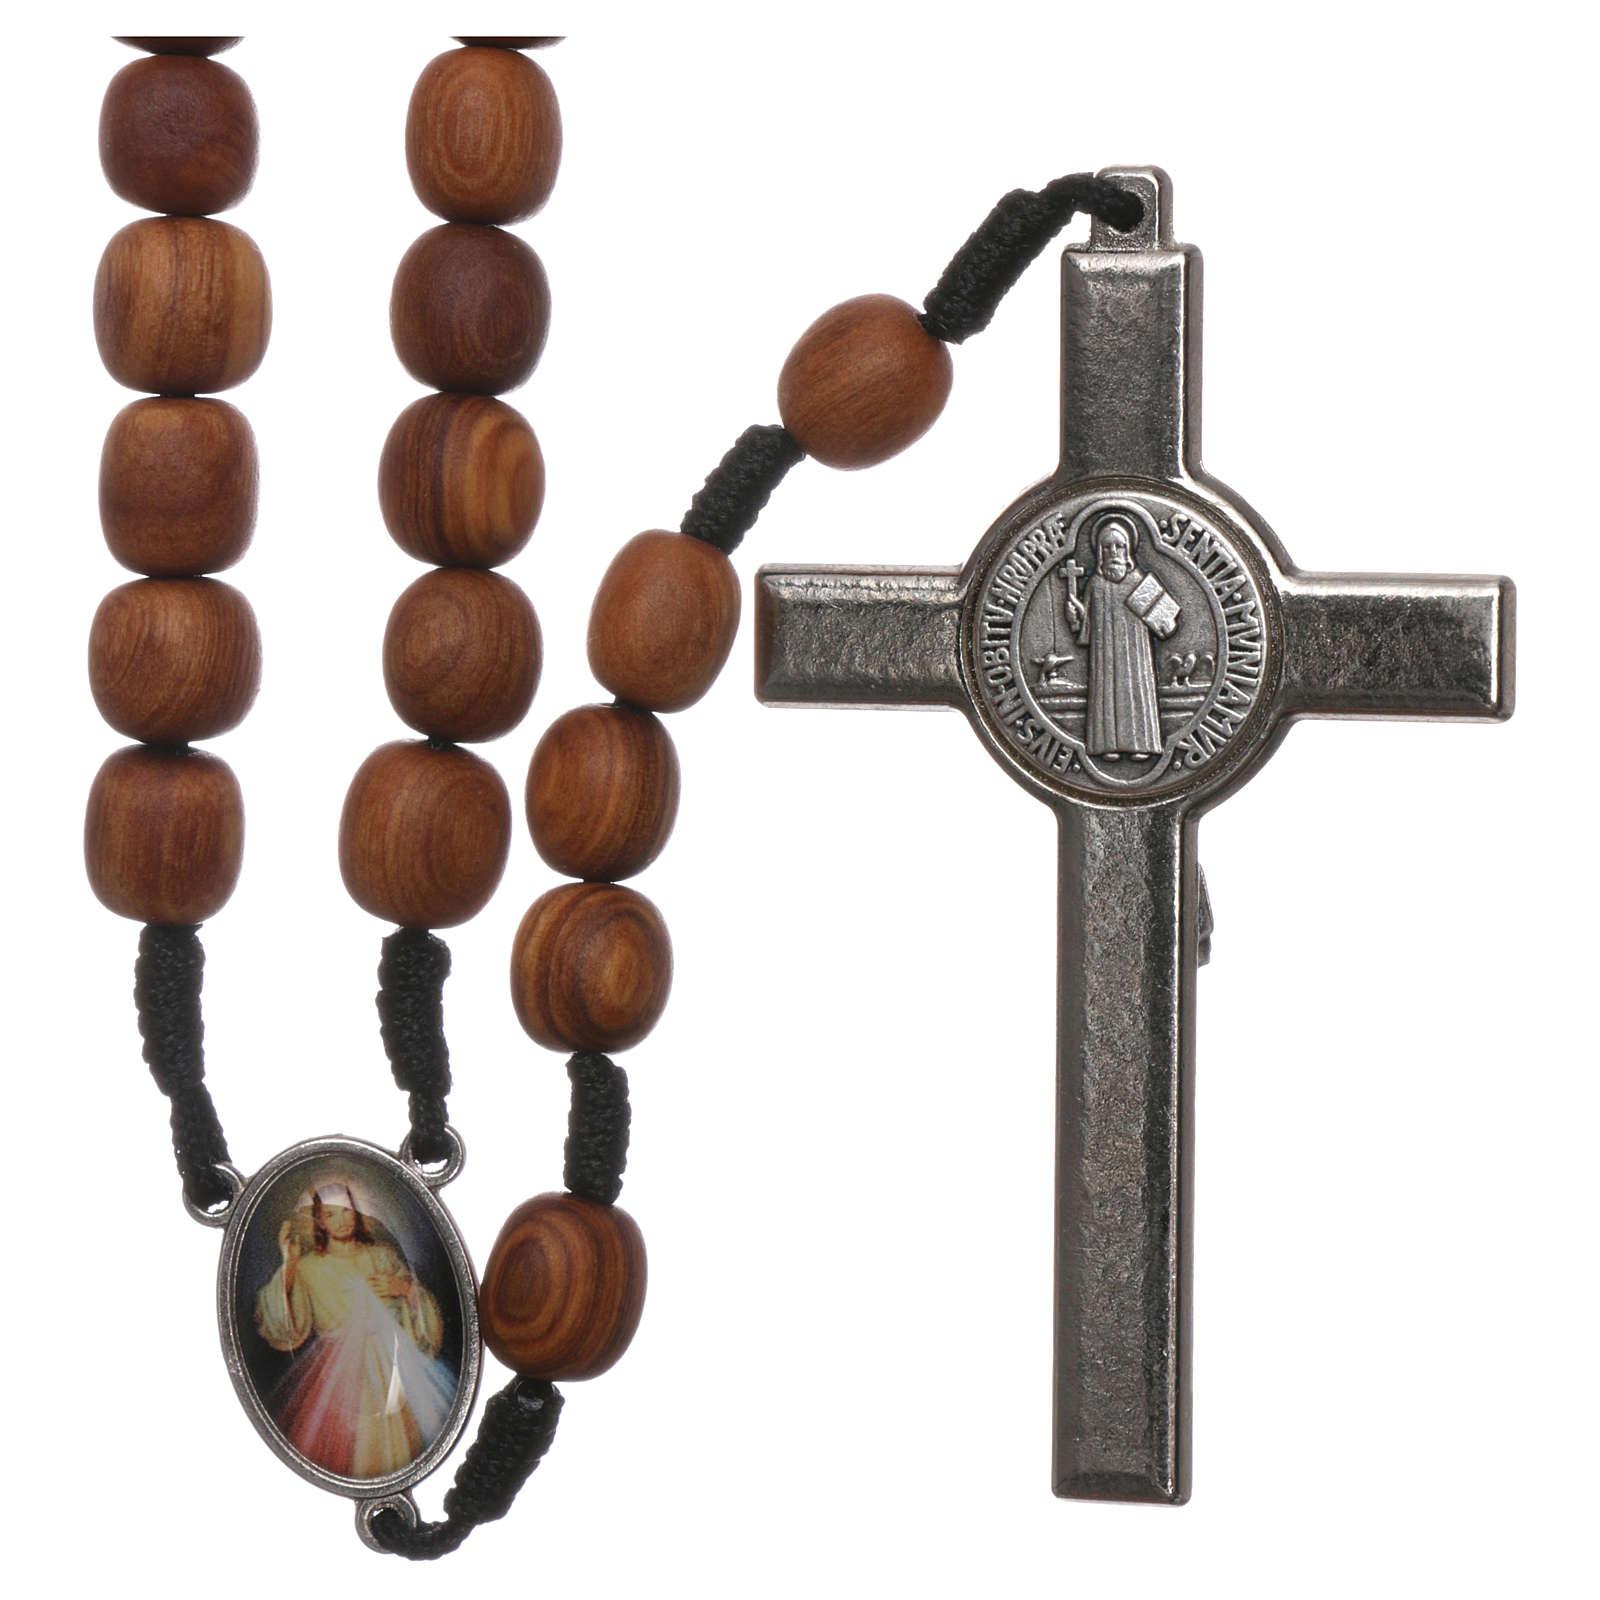 Chapelet Medjugorje bois olivier croix métal 8x5 cm 4